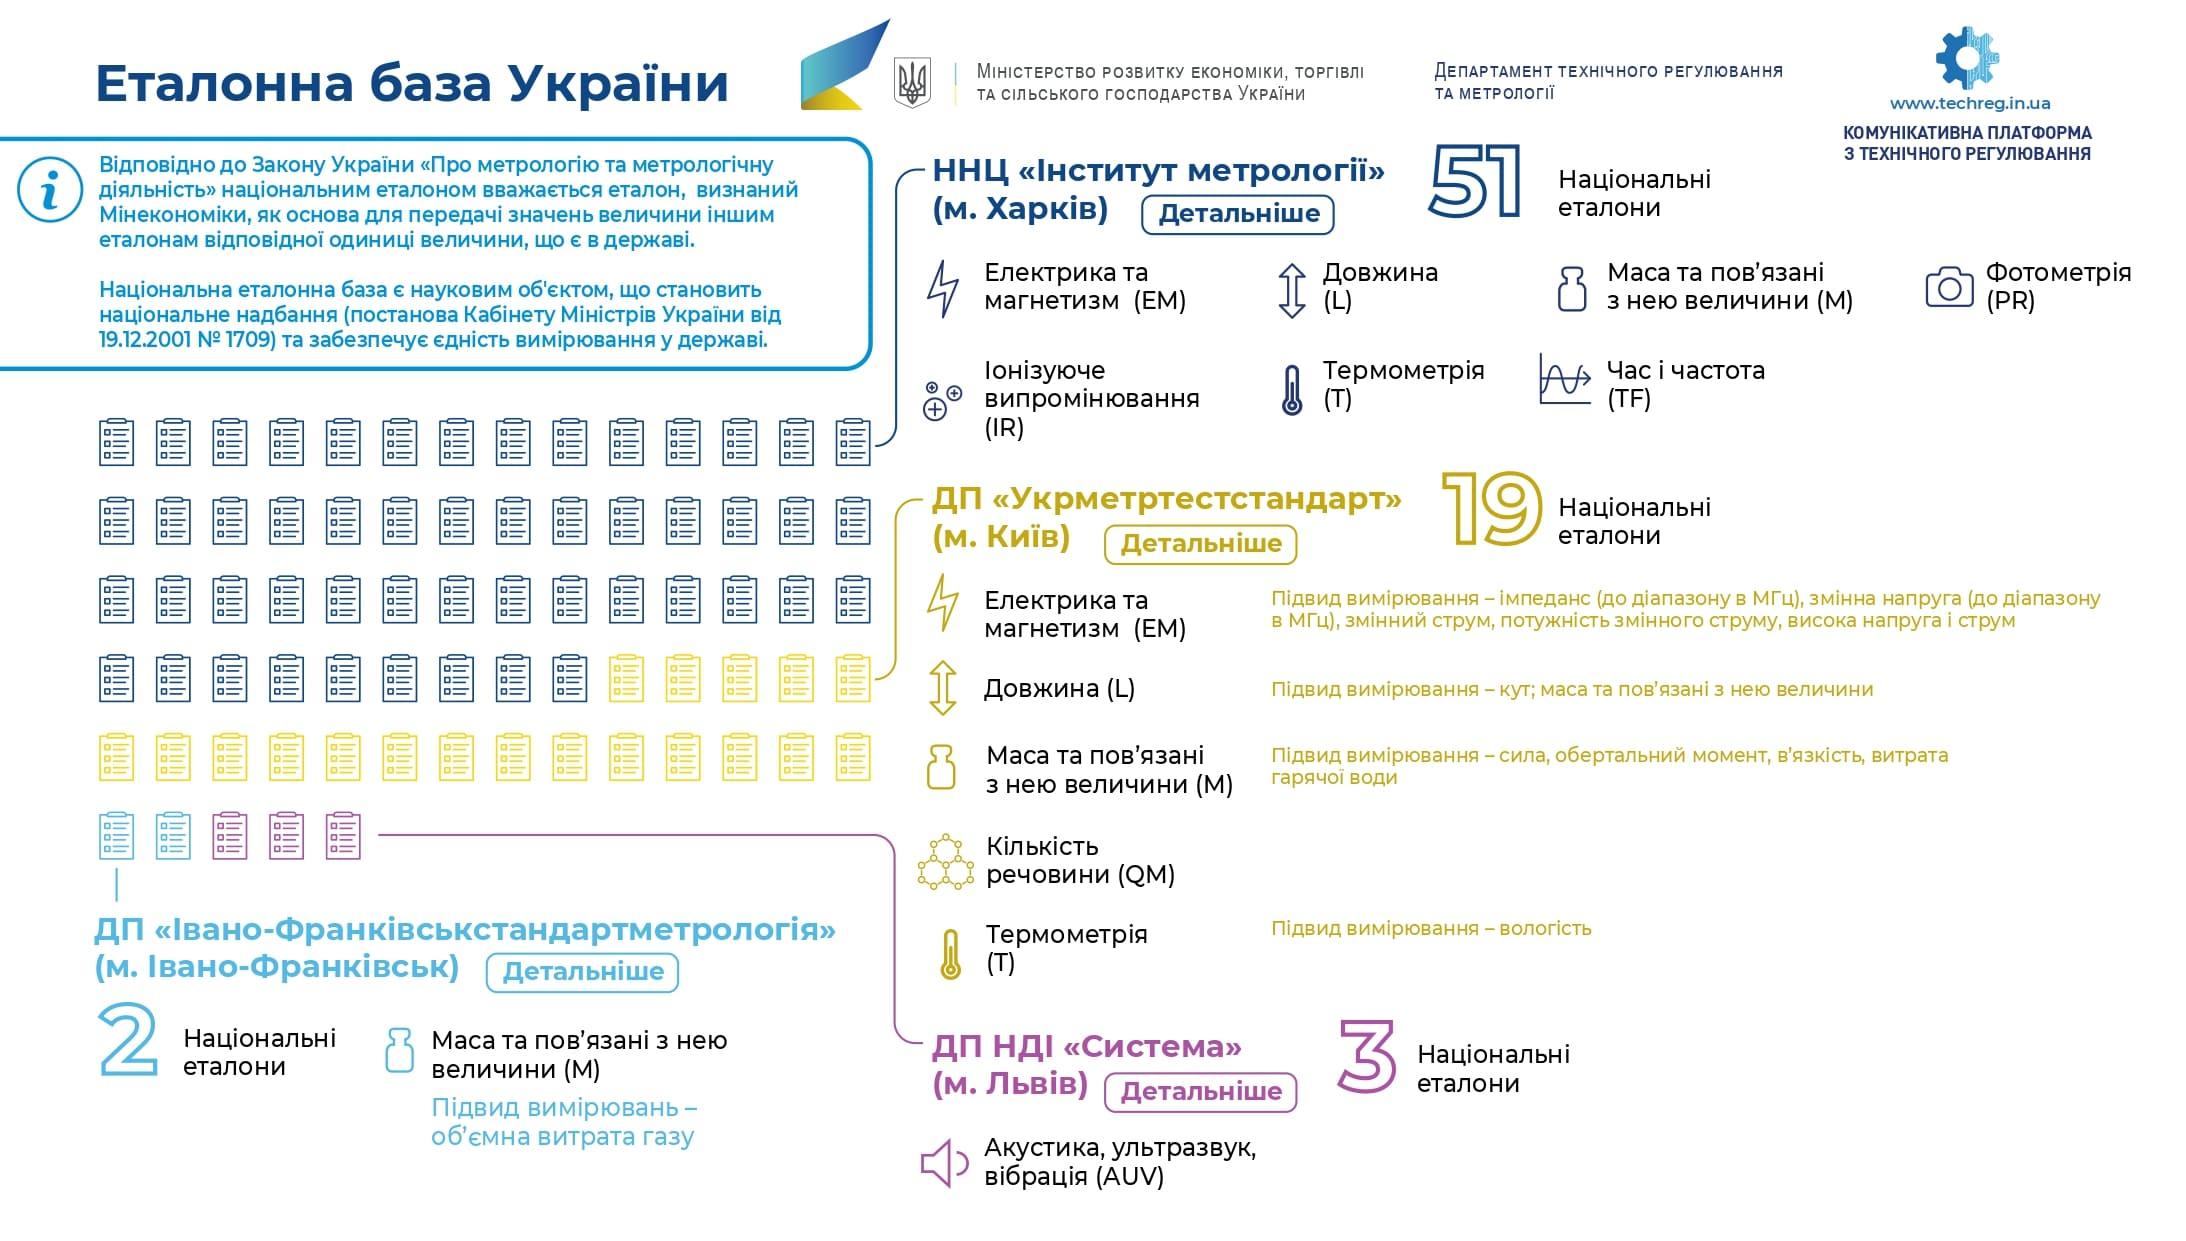 Еталонна база України